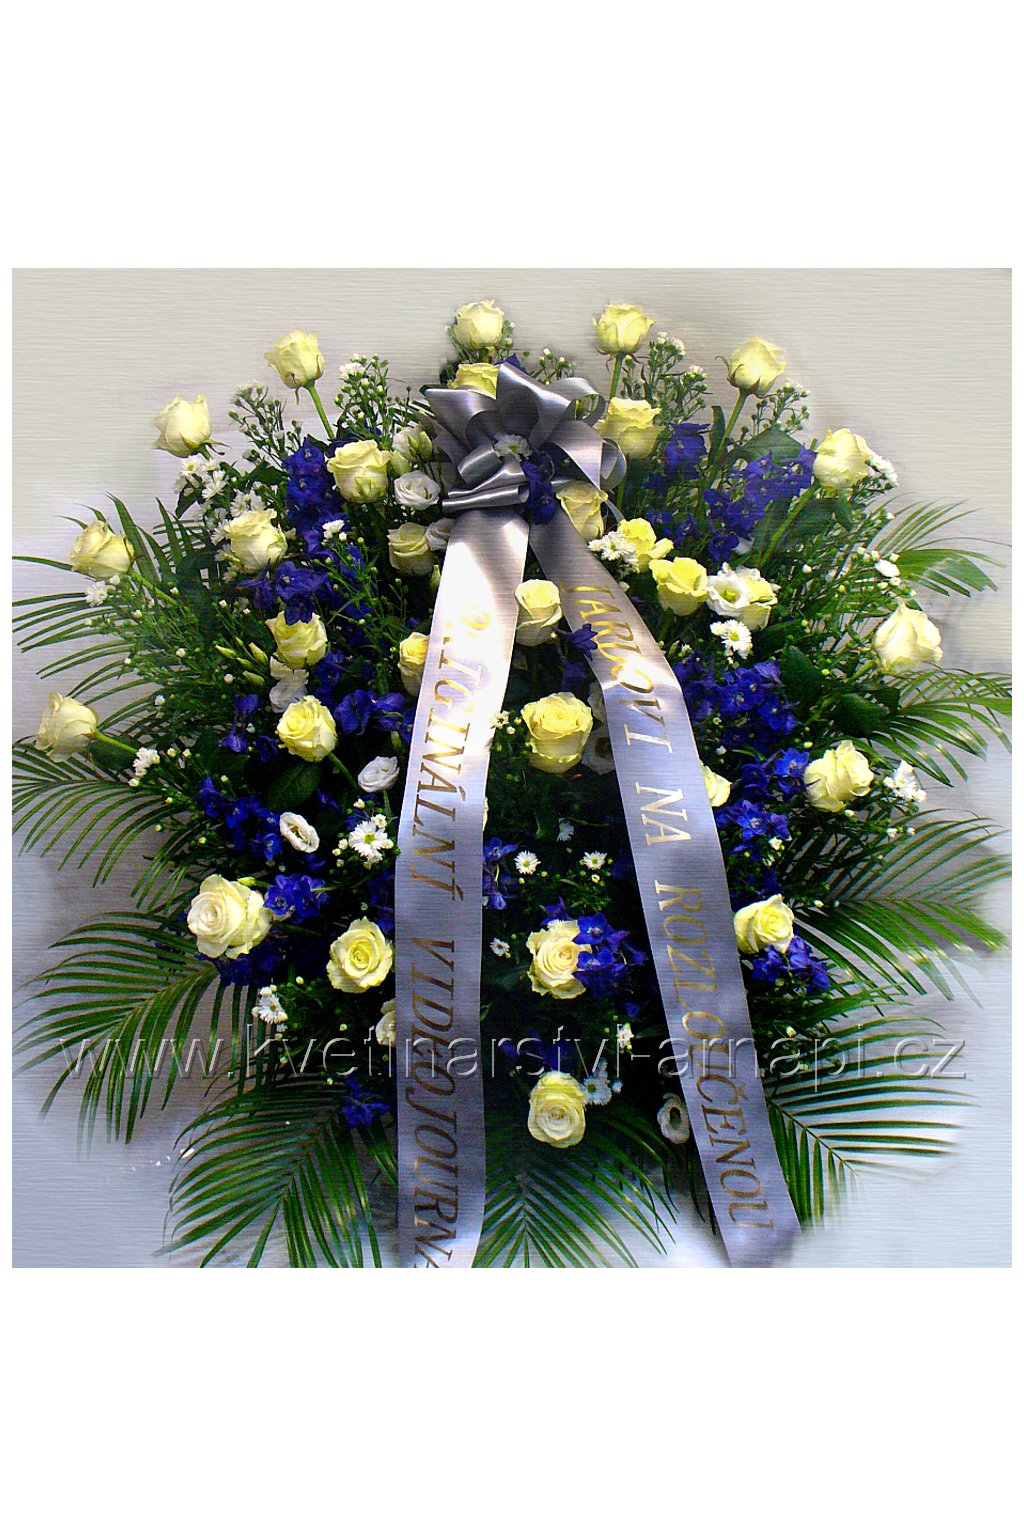 smutecni kytice kvetinarstvi arnapi